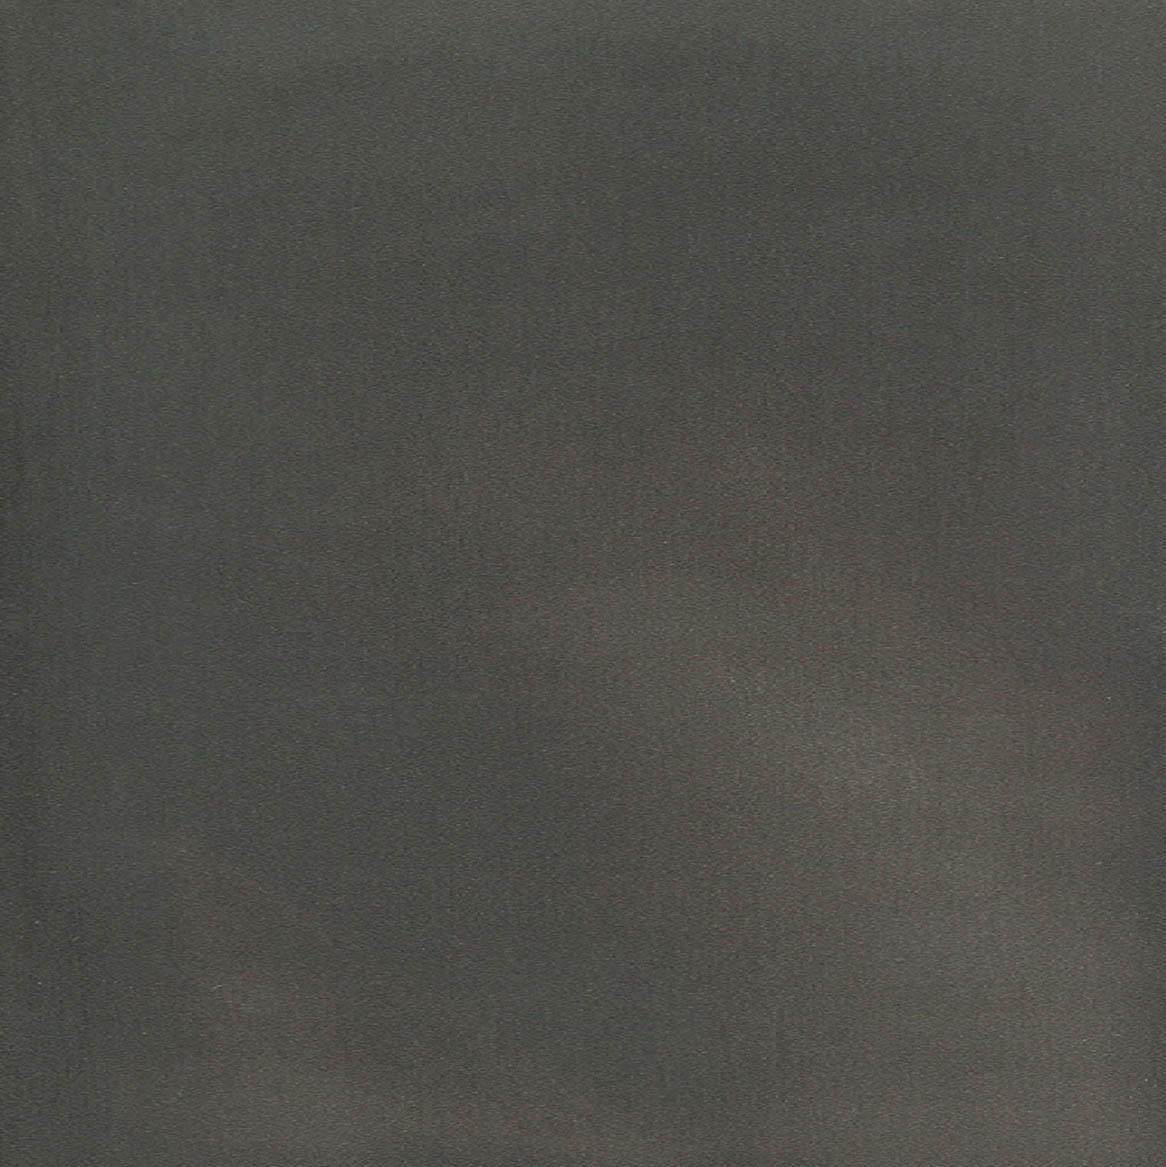 TEXTURED blackened stainless steel